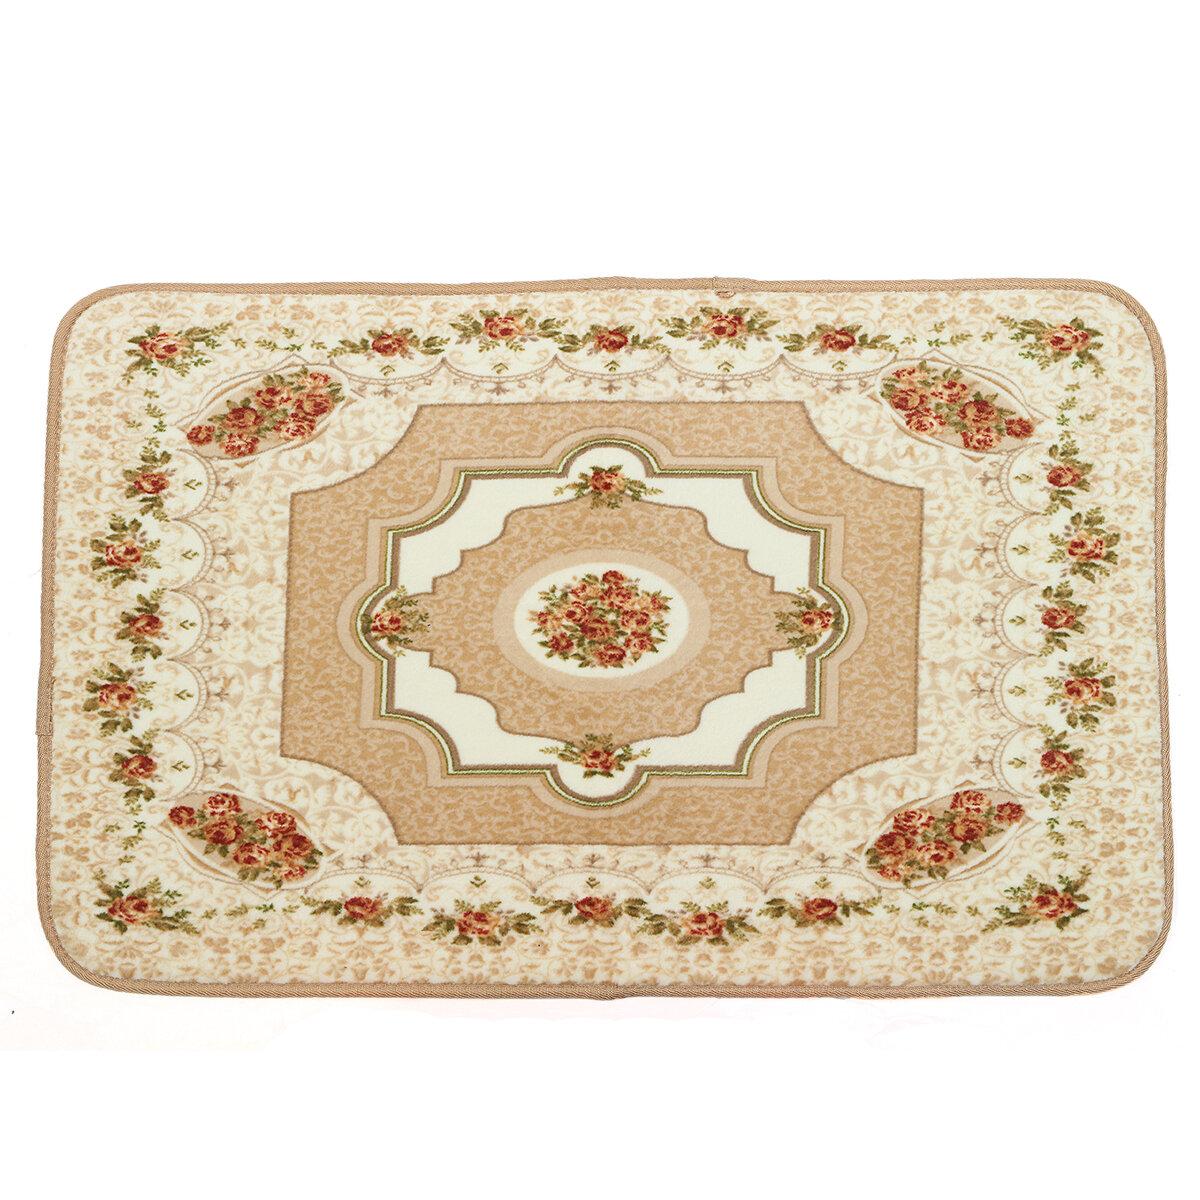 European Style Court Rose Fashionable Carpet Living Room Bedroom Sofa Table Bedside Floor Mats